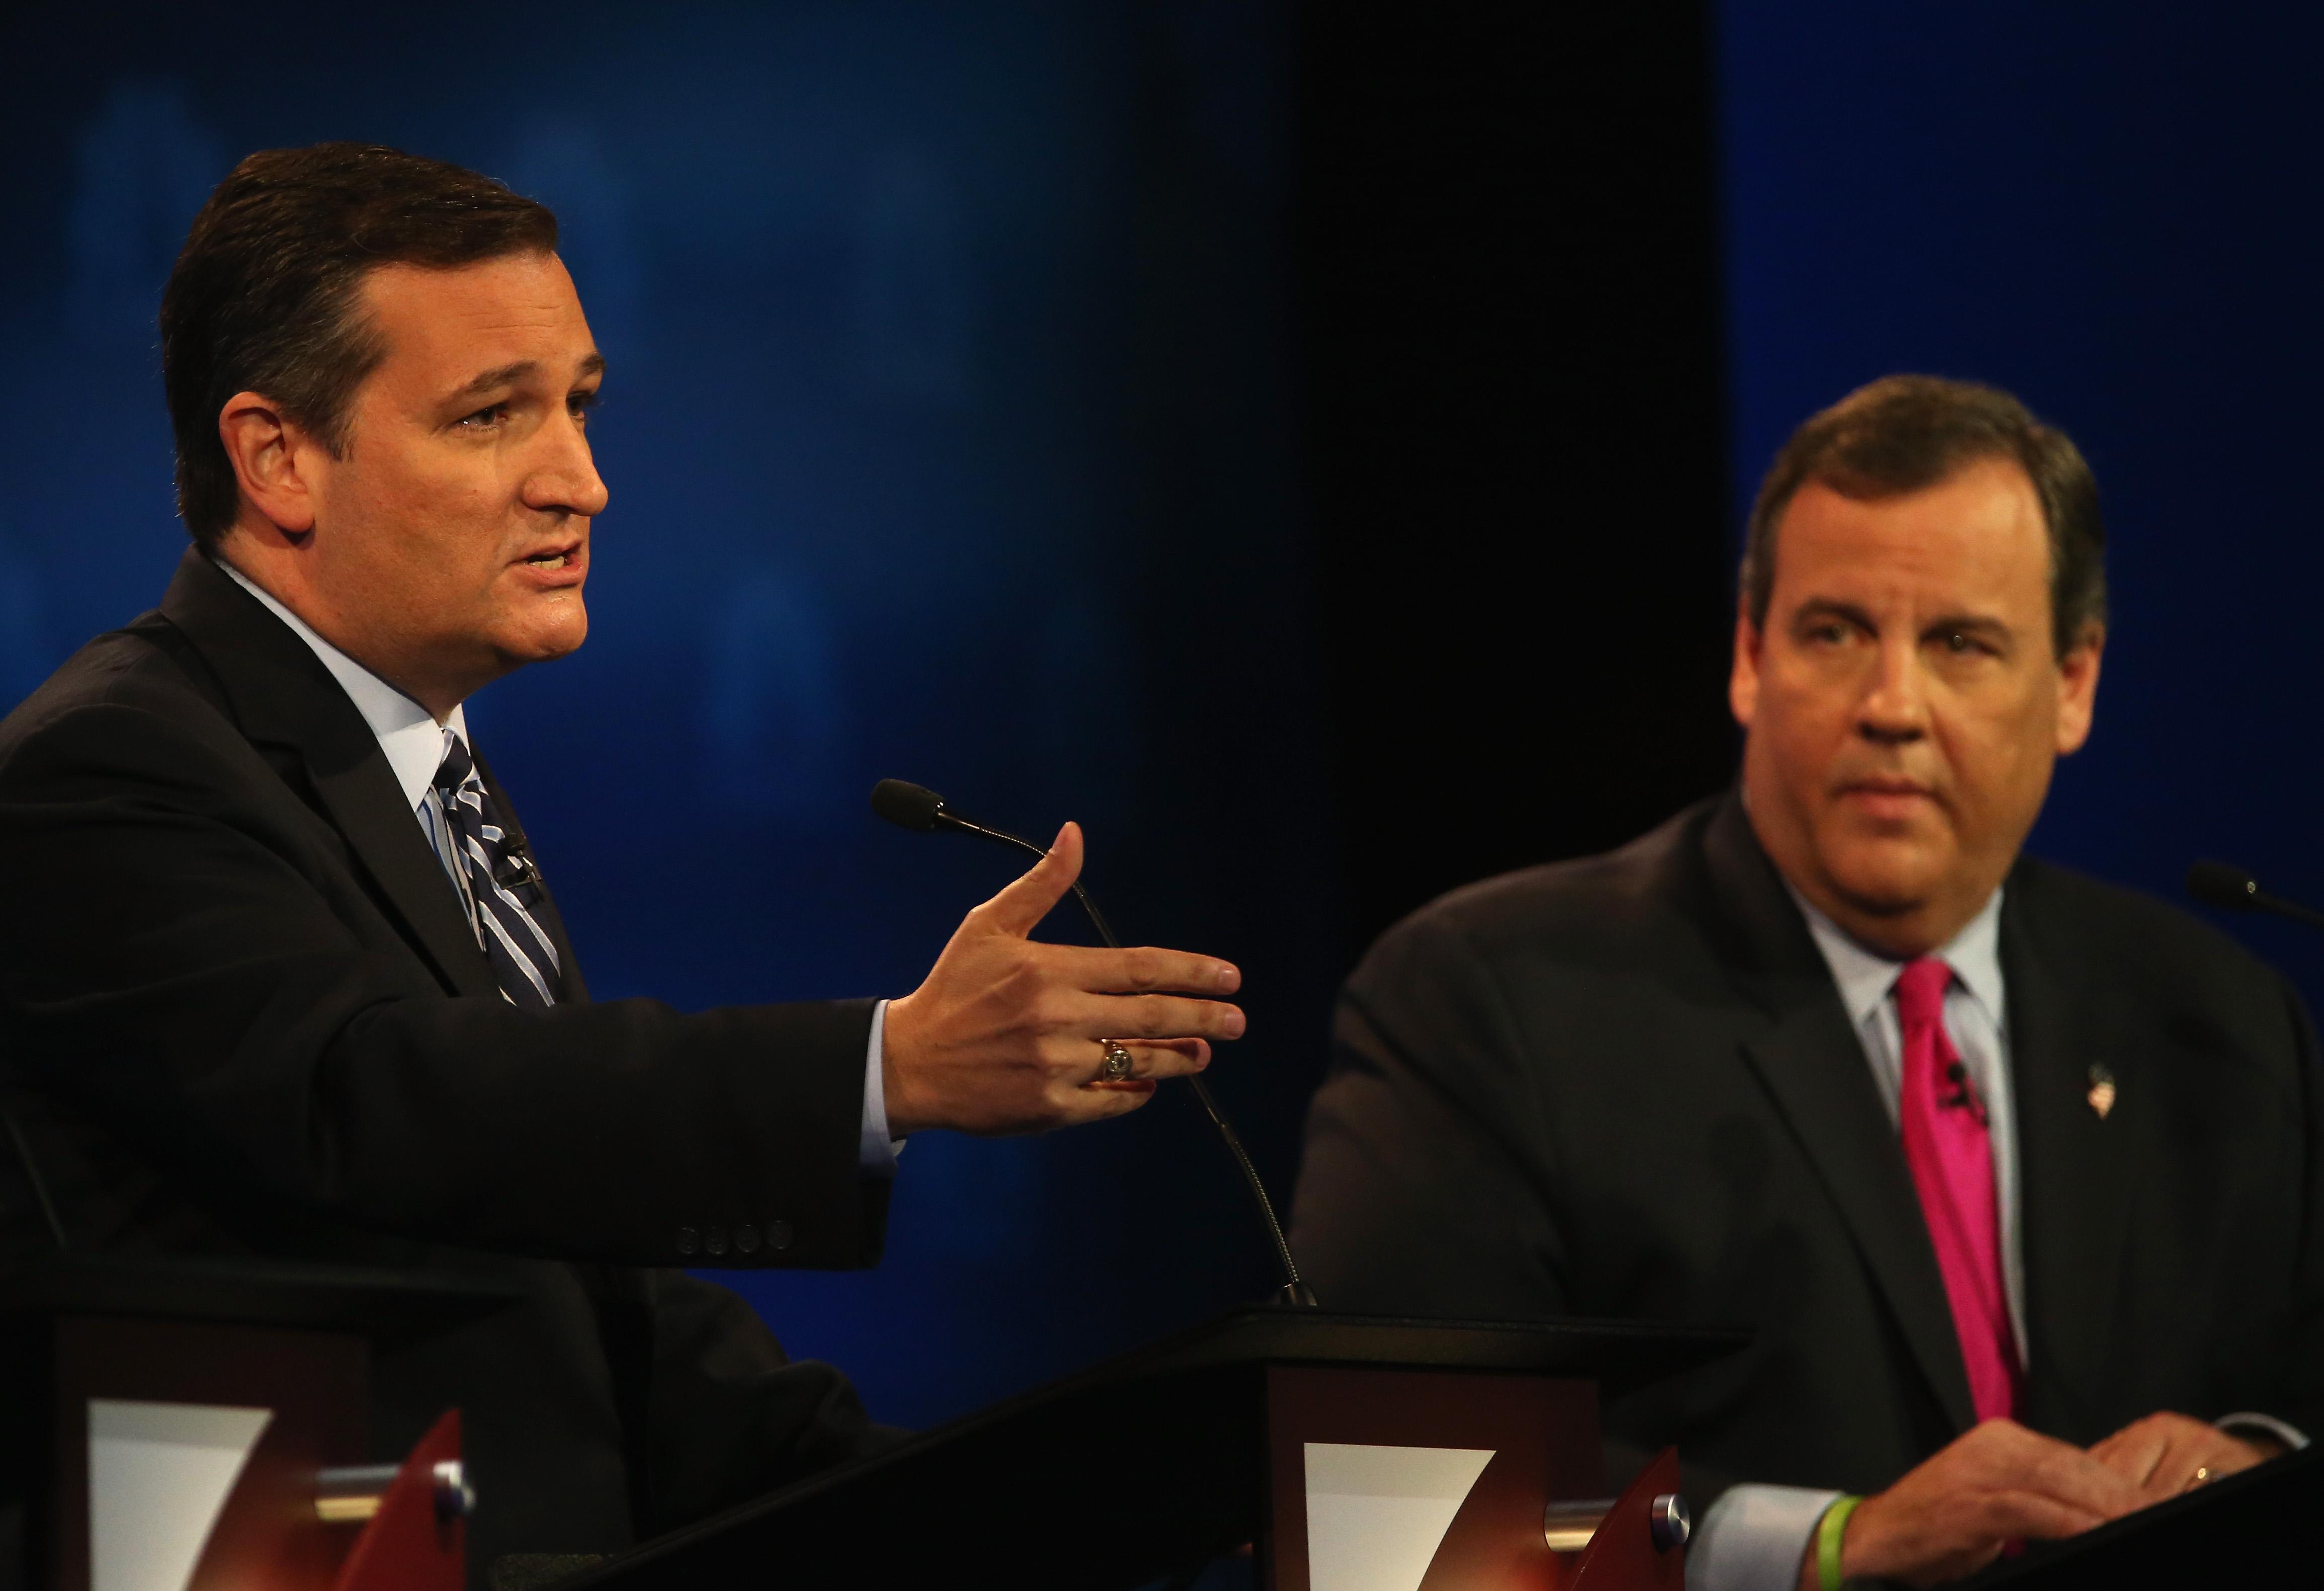 Ted Cruz and Chris Christie